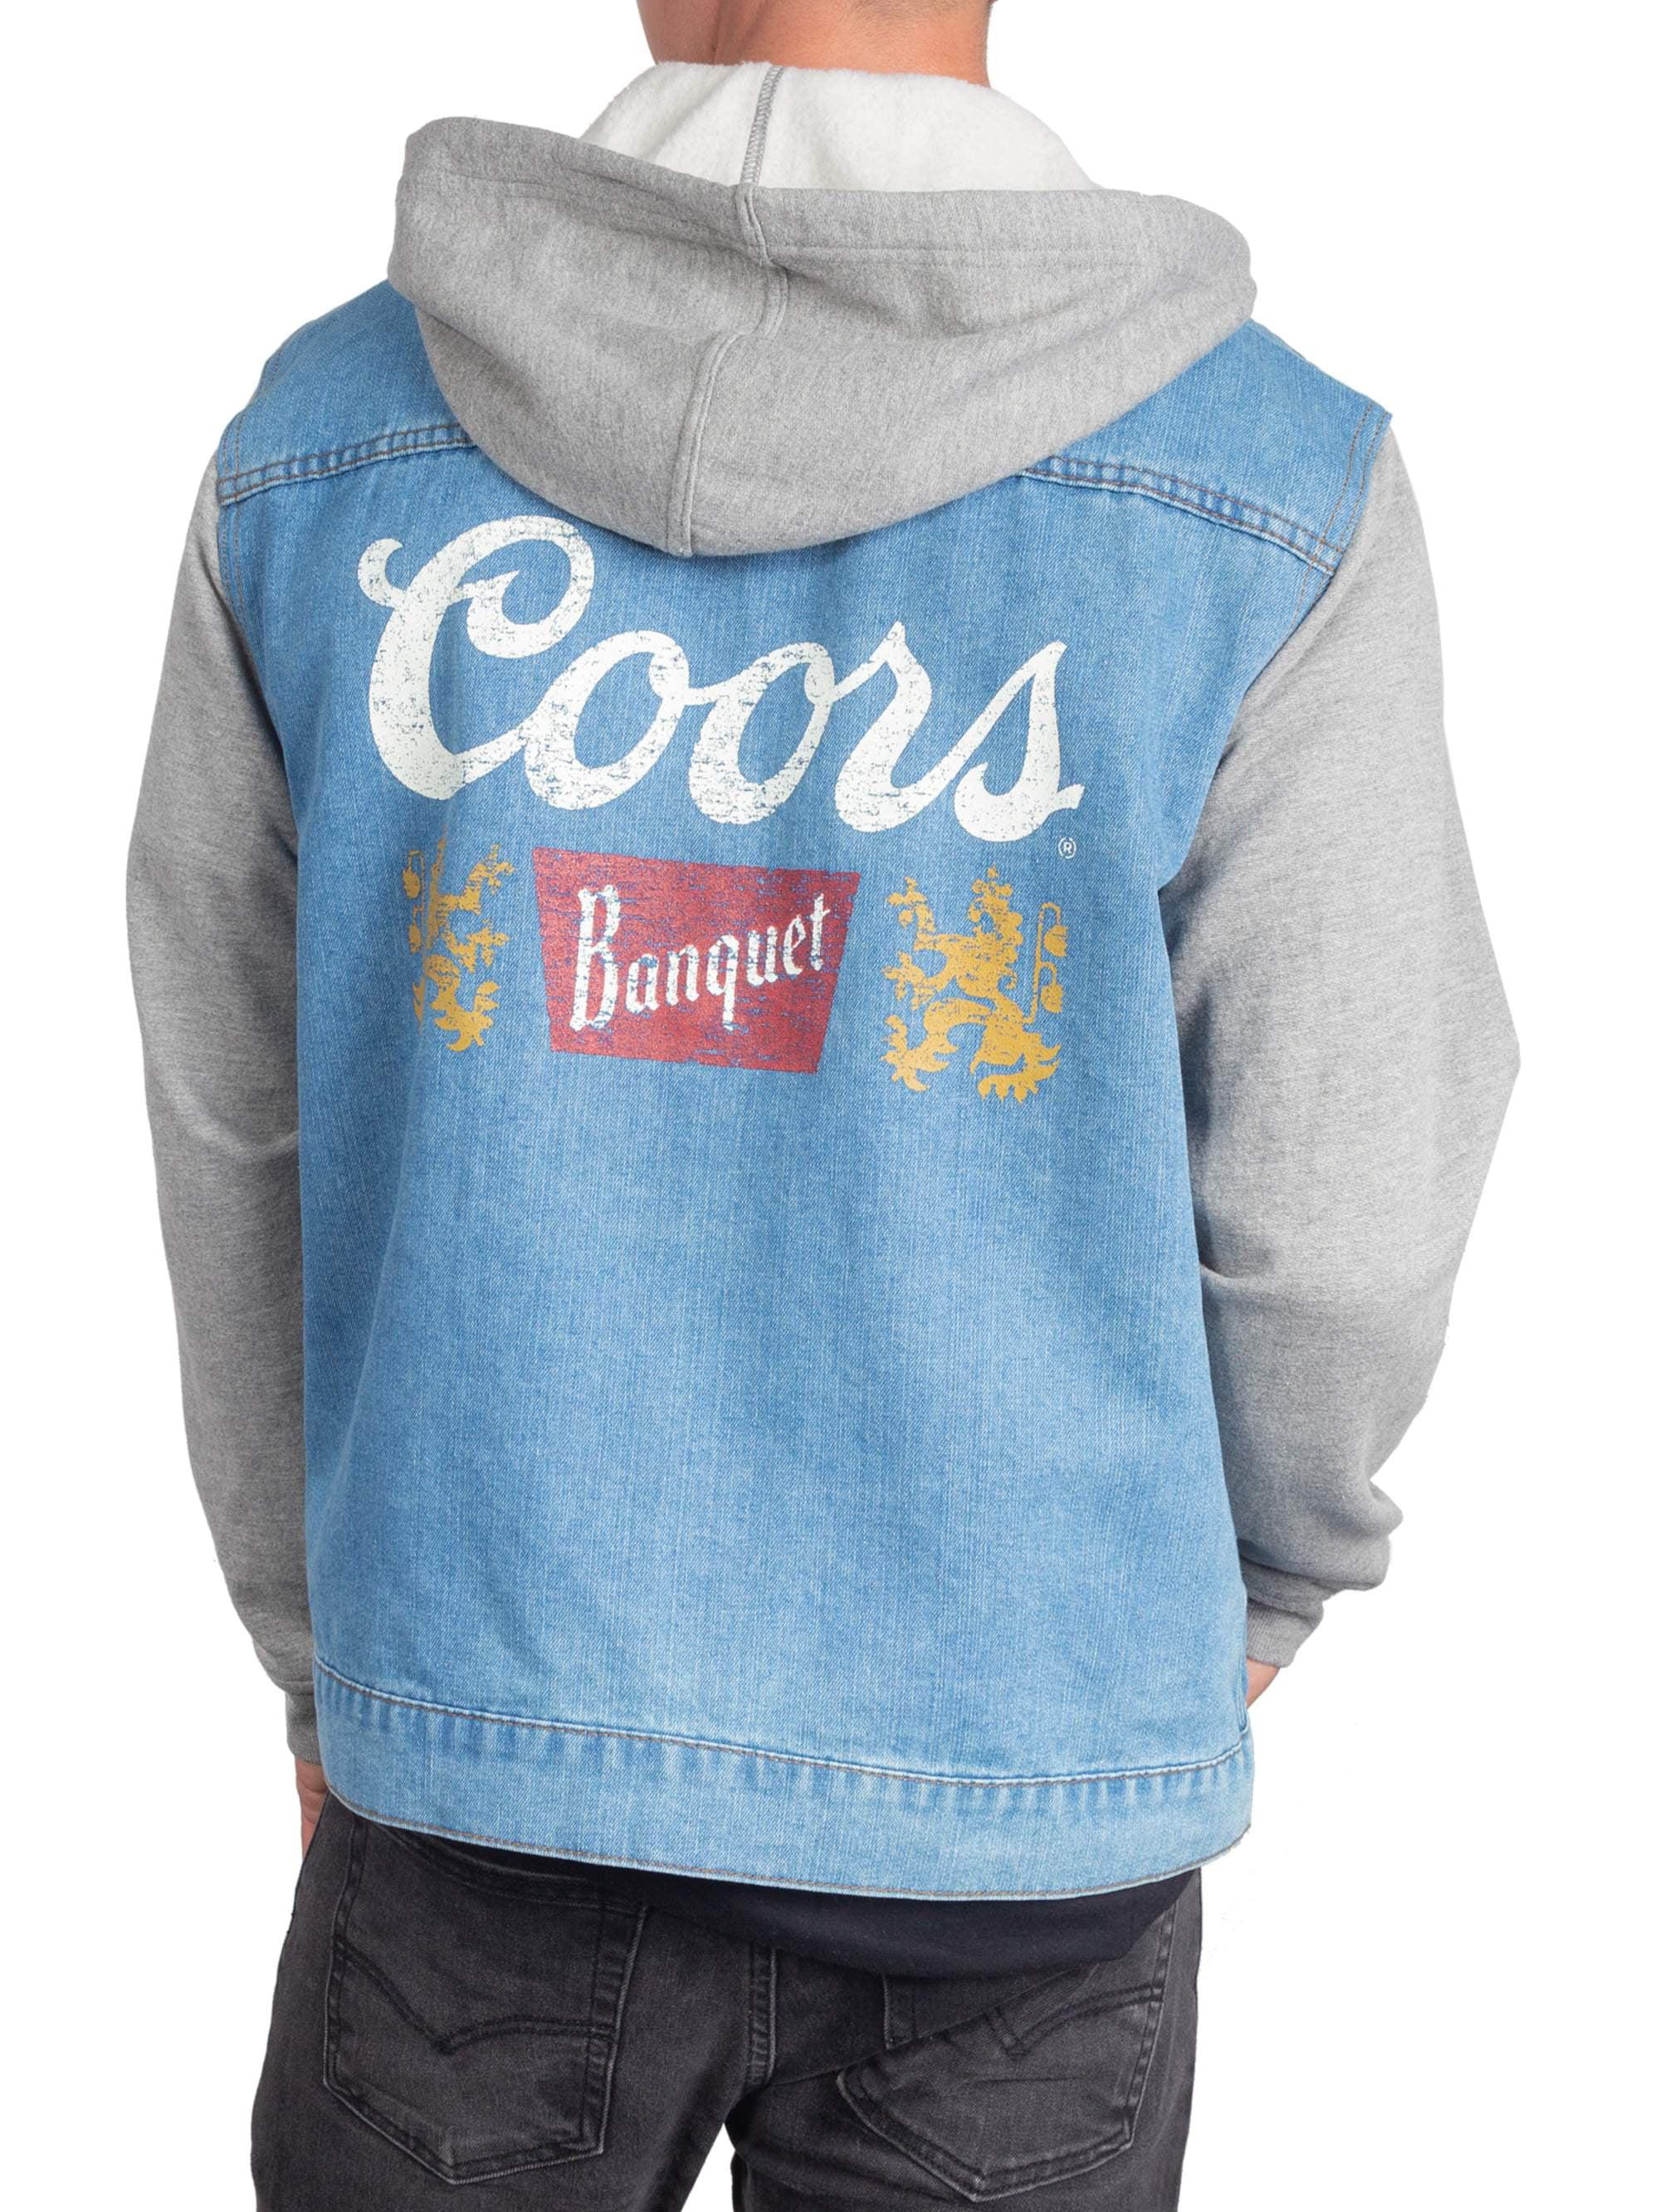 707db18141d Food & Beverage - Classic Coors Men's Denim Jacket Hoodie , up to size 2XL  - Walmart.com